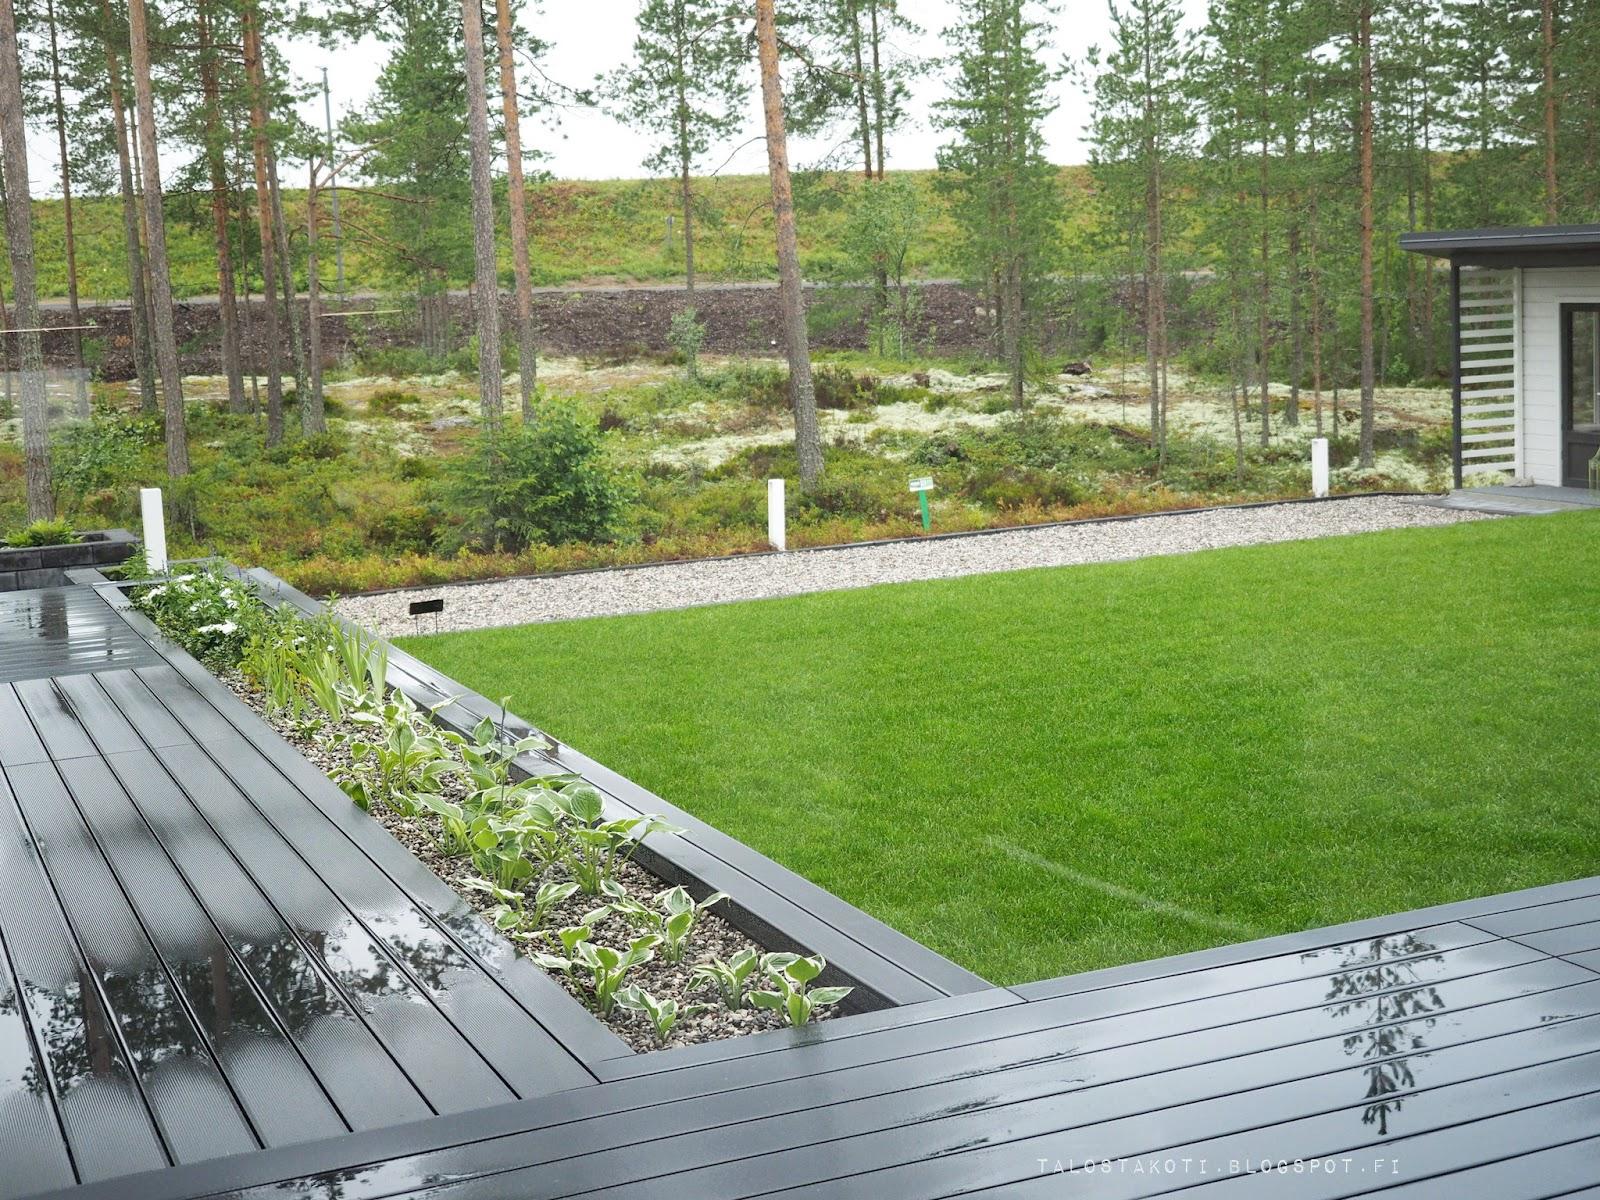 Asuntomessut 2016 Lakka Lakeus piha terassi